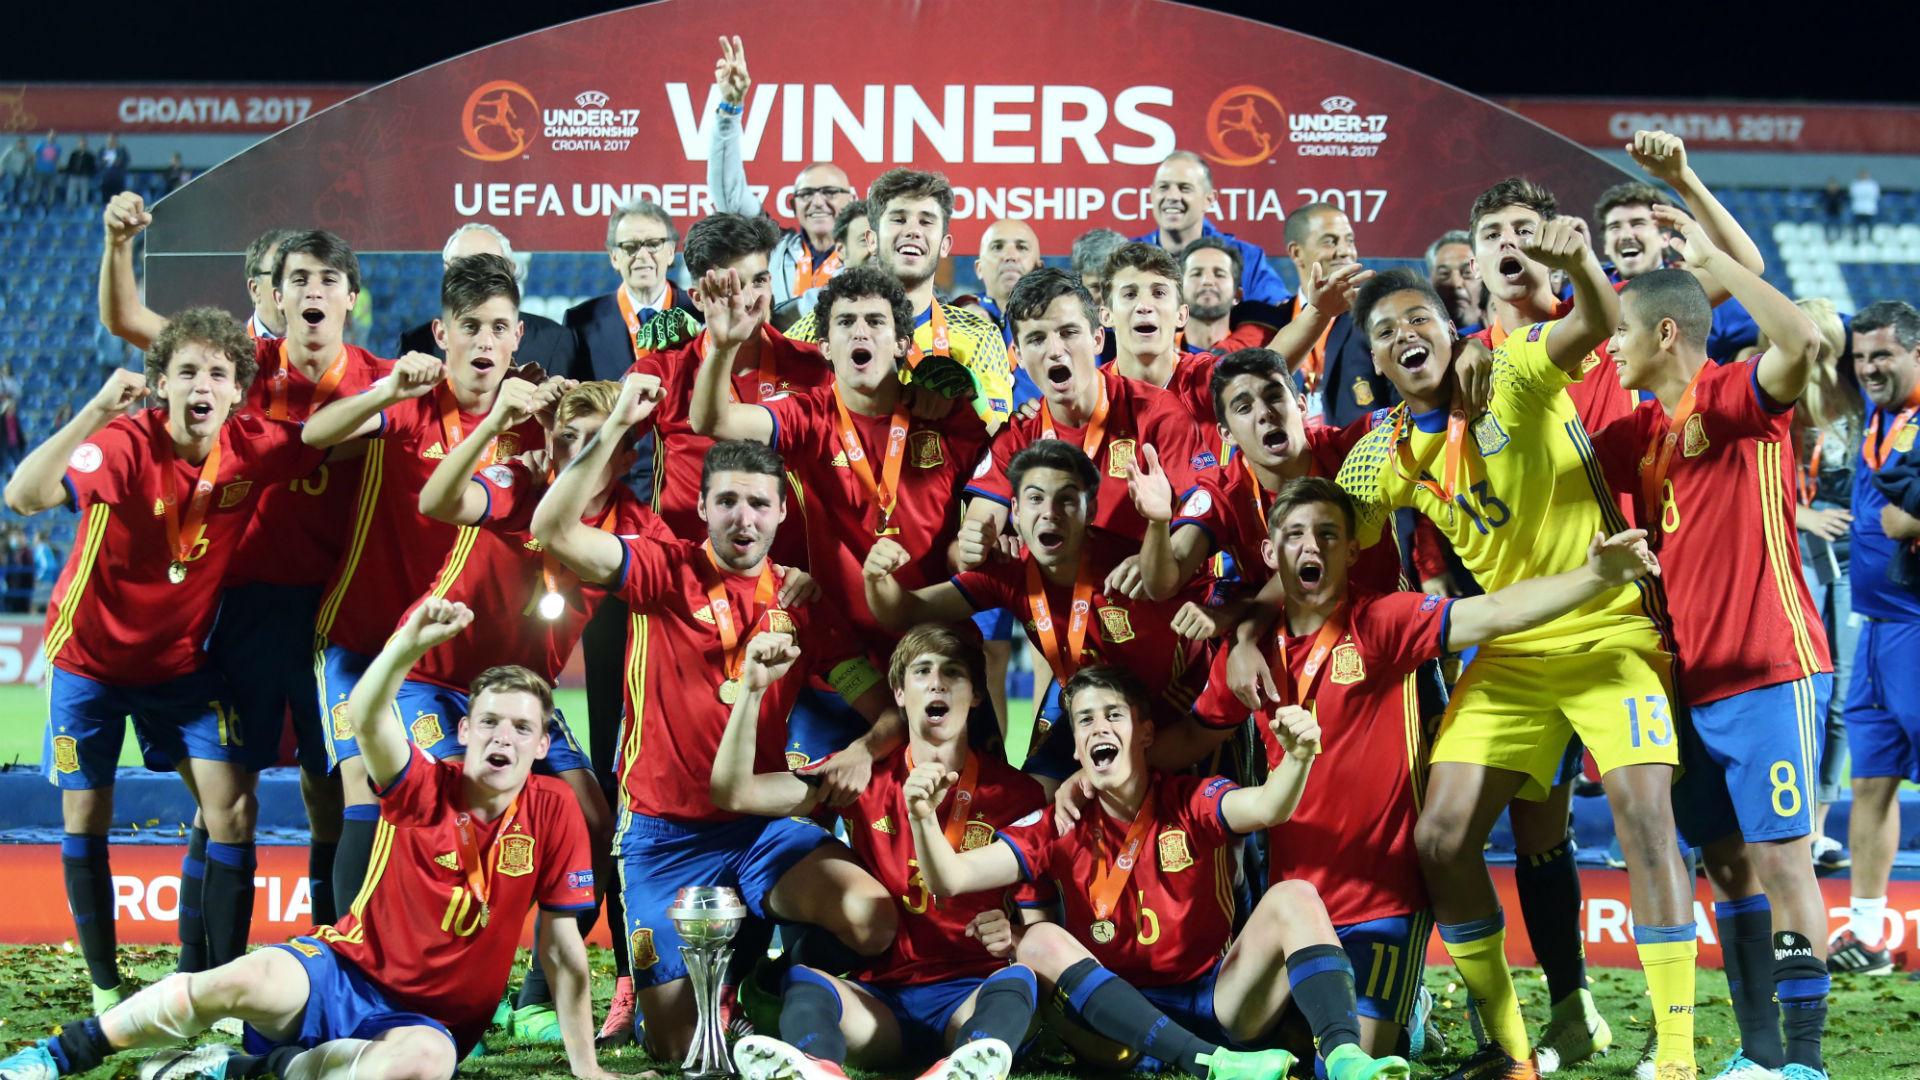 'We should be proud' - England U17 boss